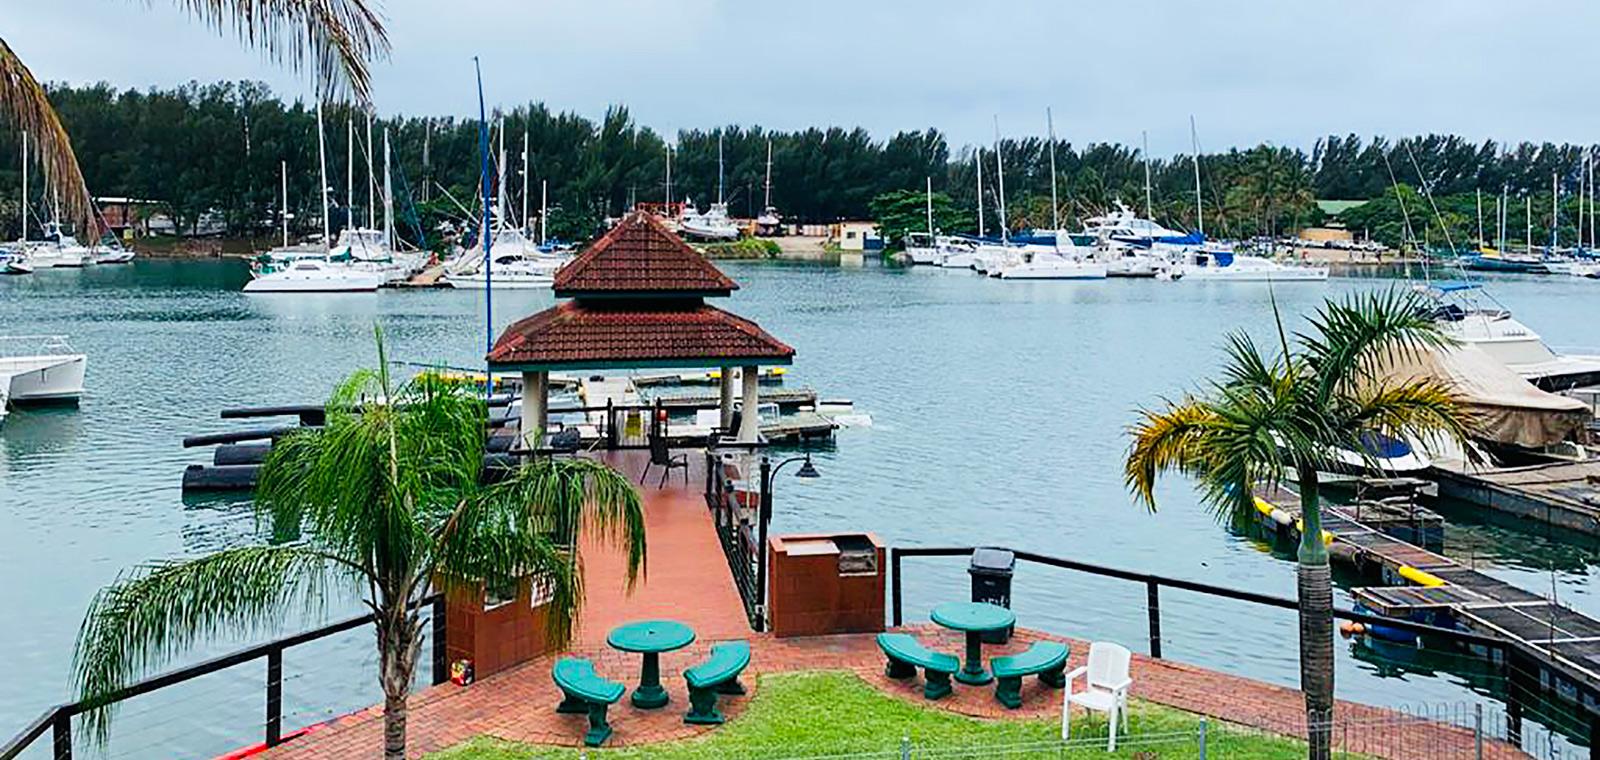 Richards Bay Business Accommodation Rentals